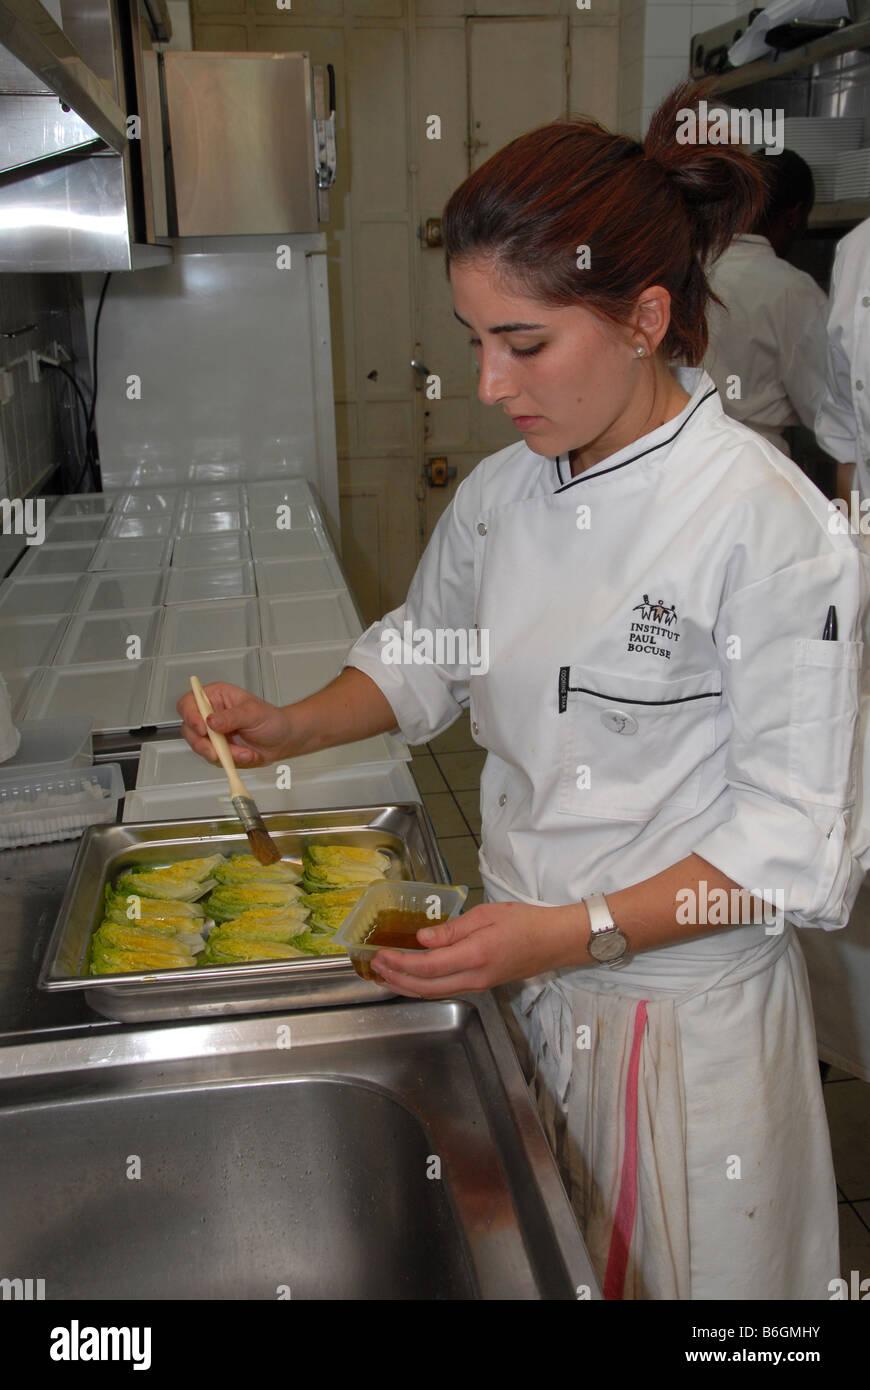 A young girl chef in a busy kitchen at the Cafe de la Cloche in rue de la Charité, Lyon,France. - Stock Image